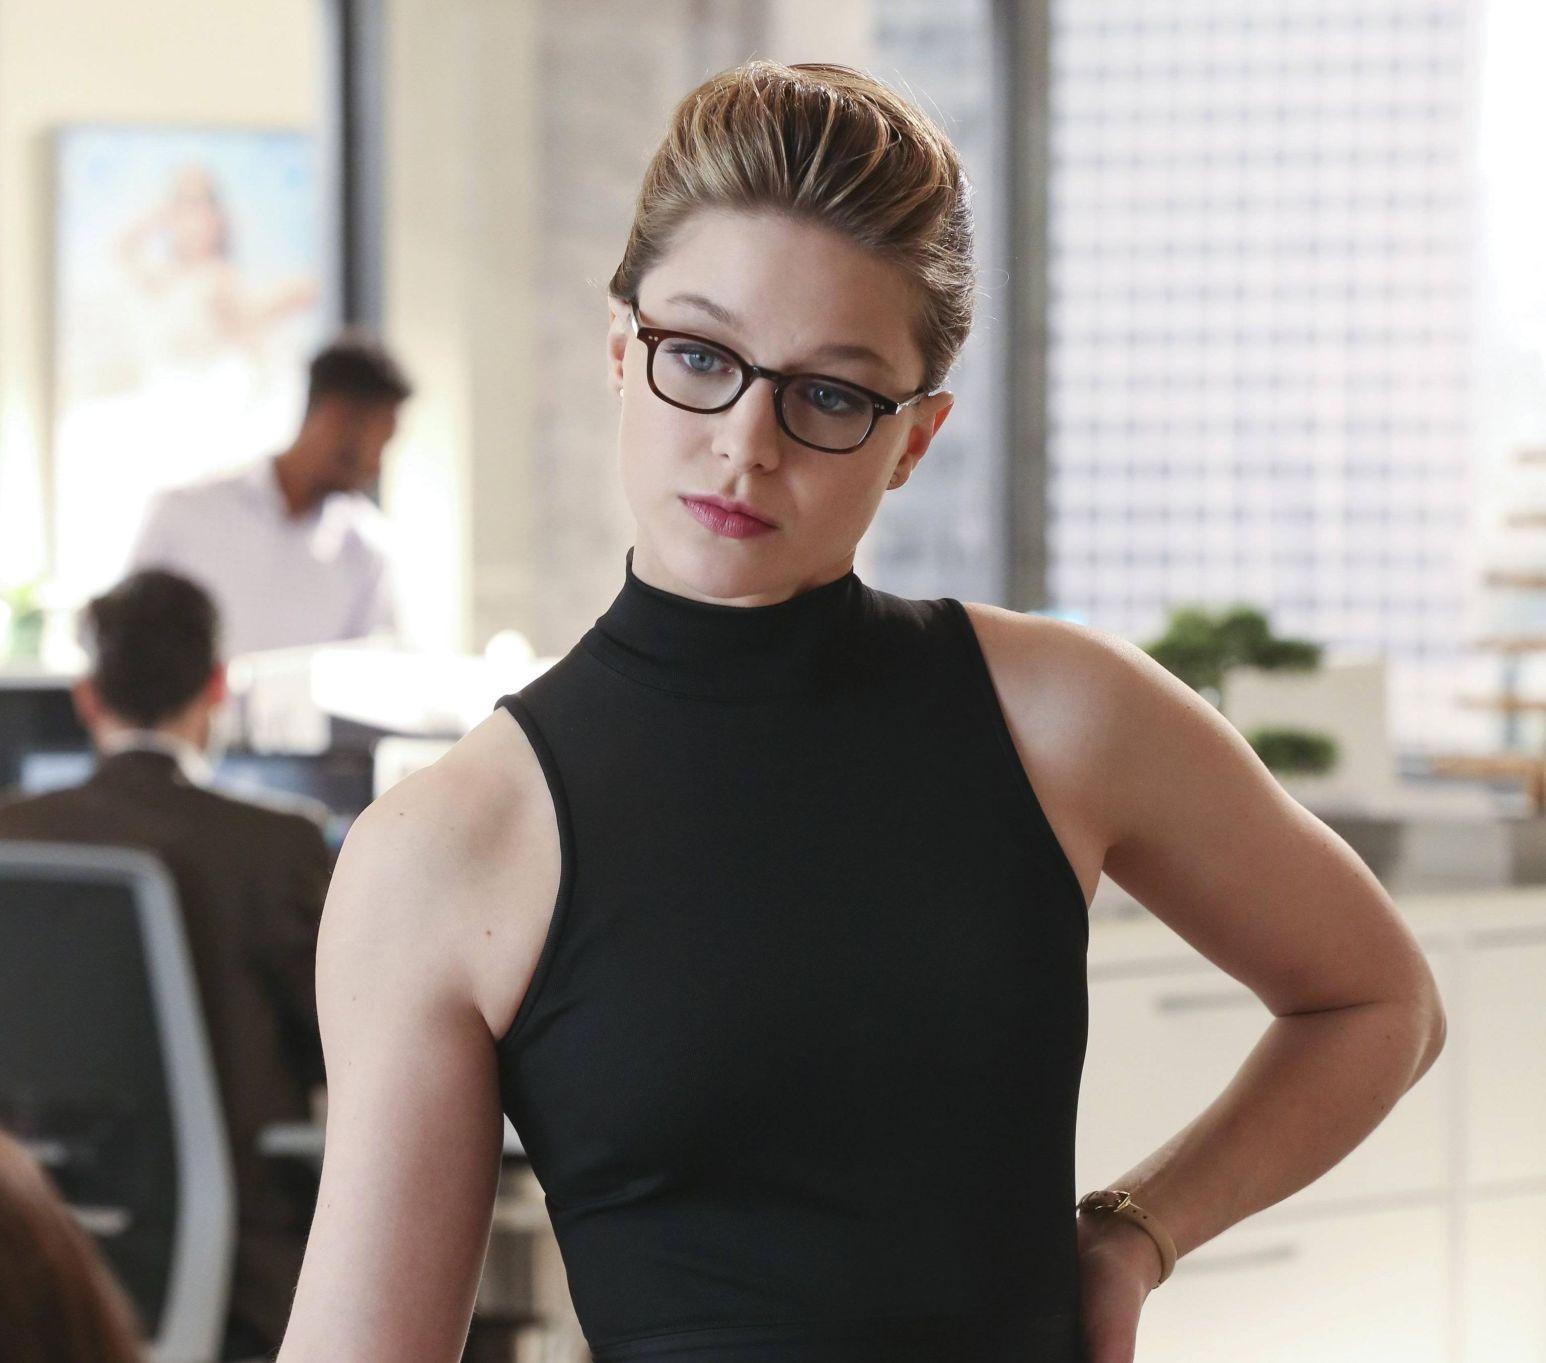 melissa benoist in supergirl 0m